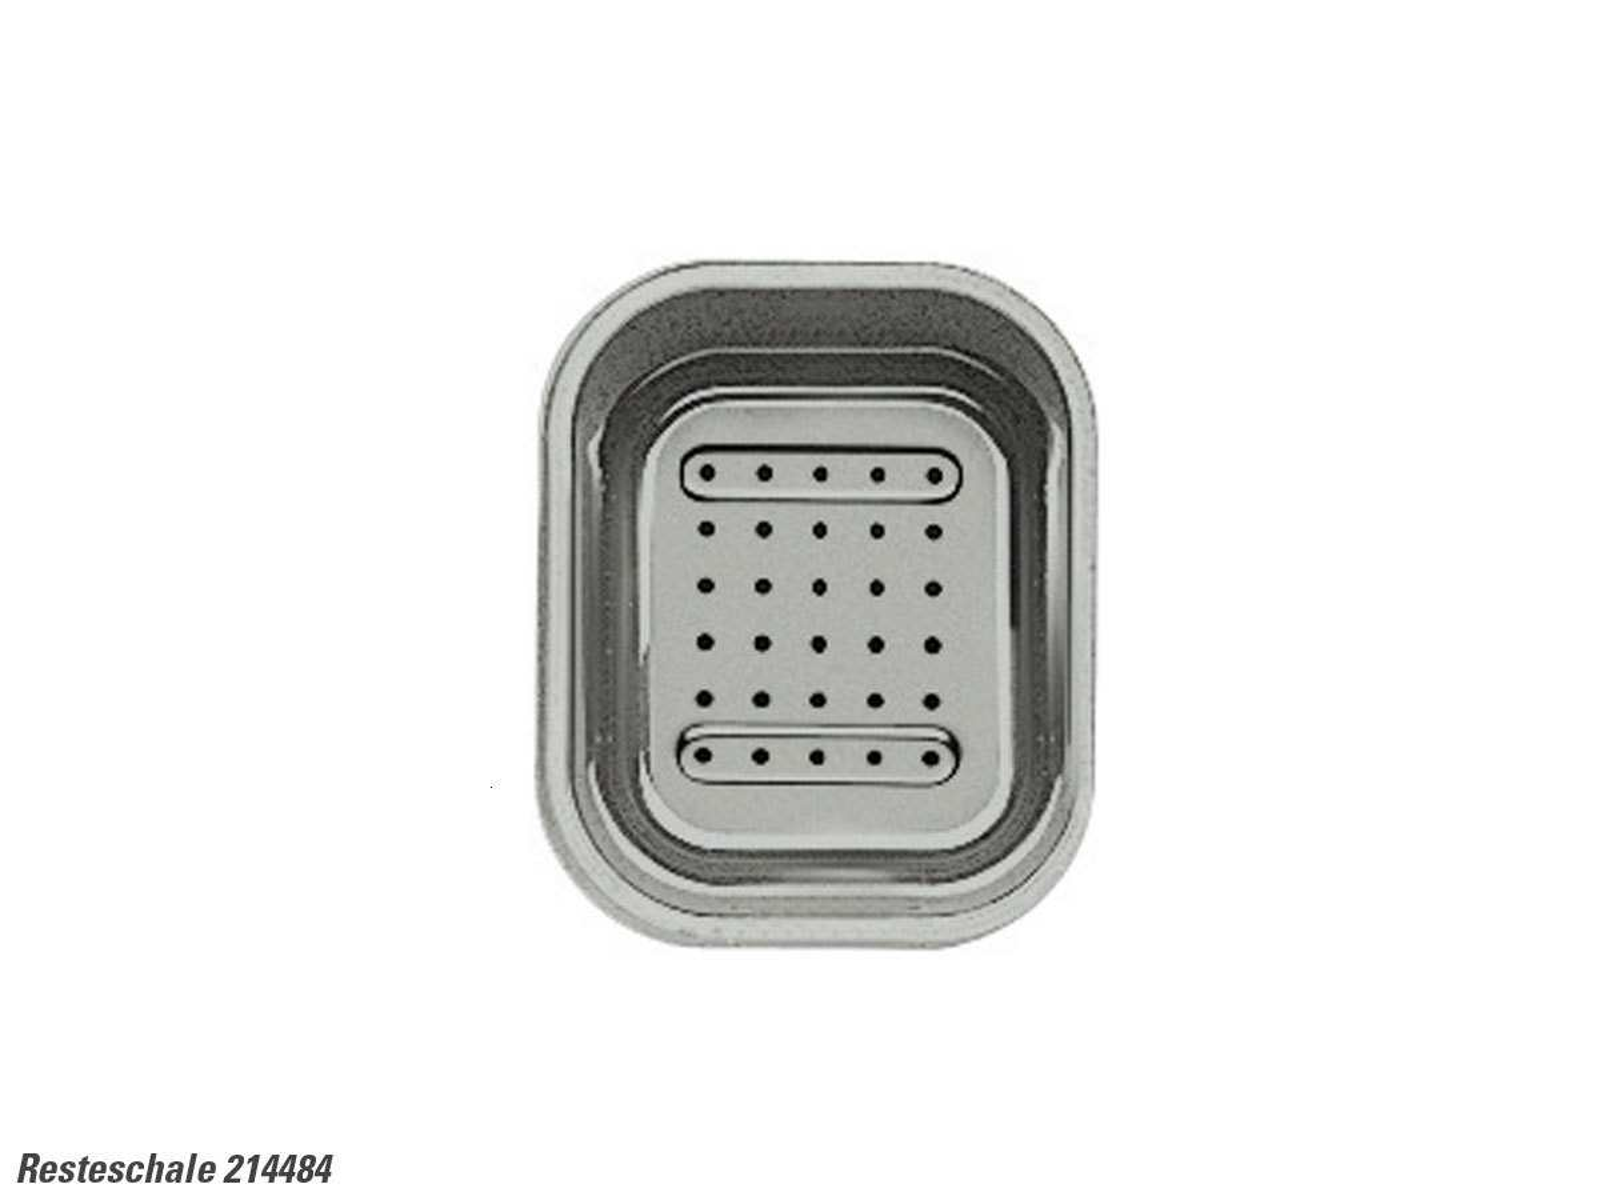 Blanco 214 484 Resteschale Kunststoff grau